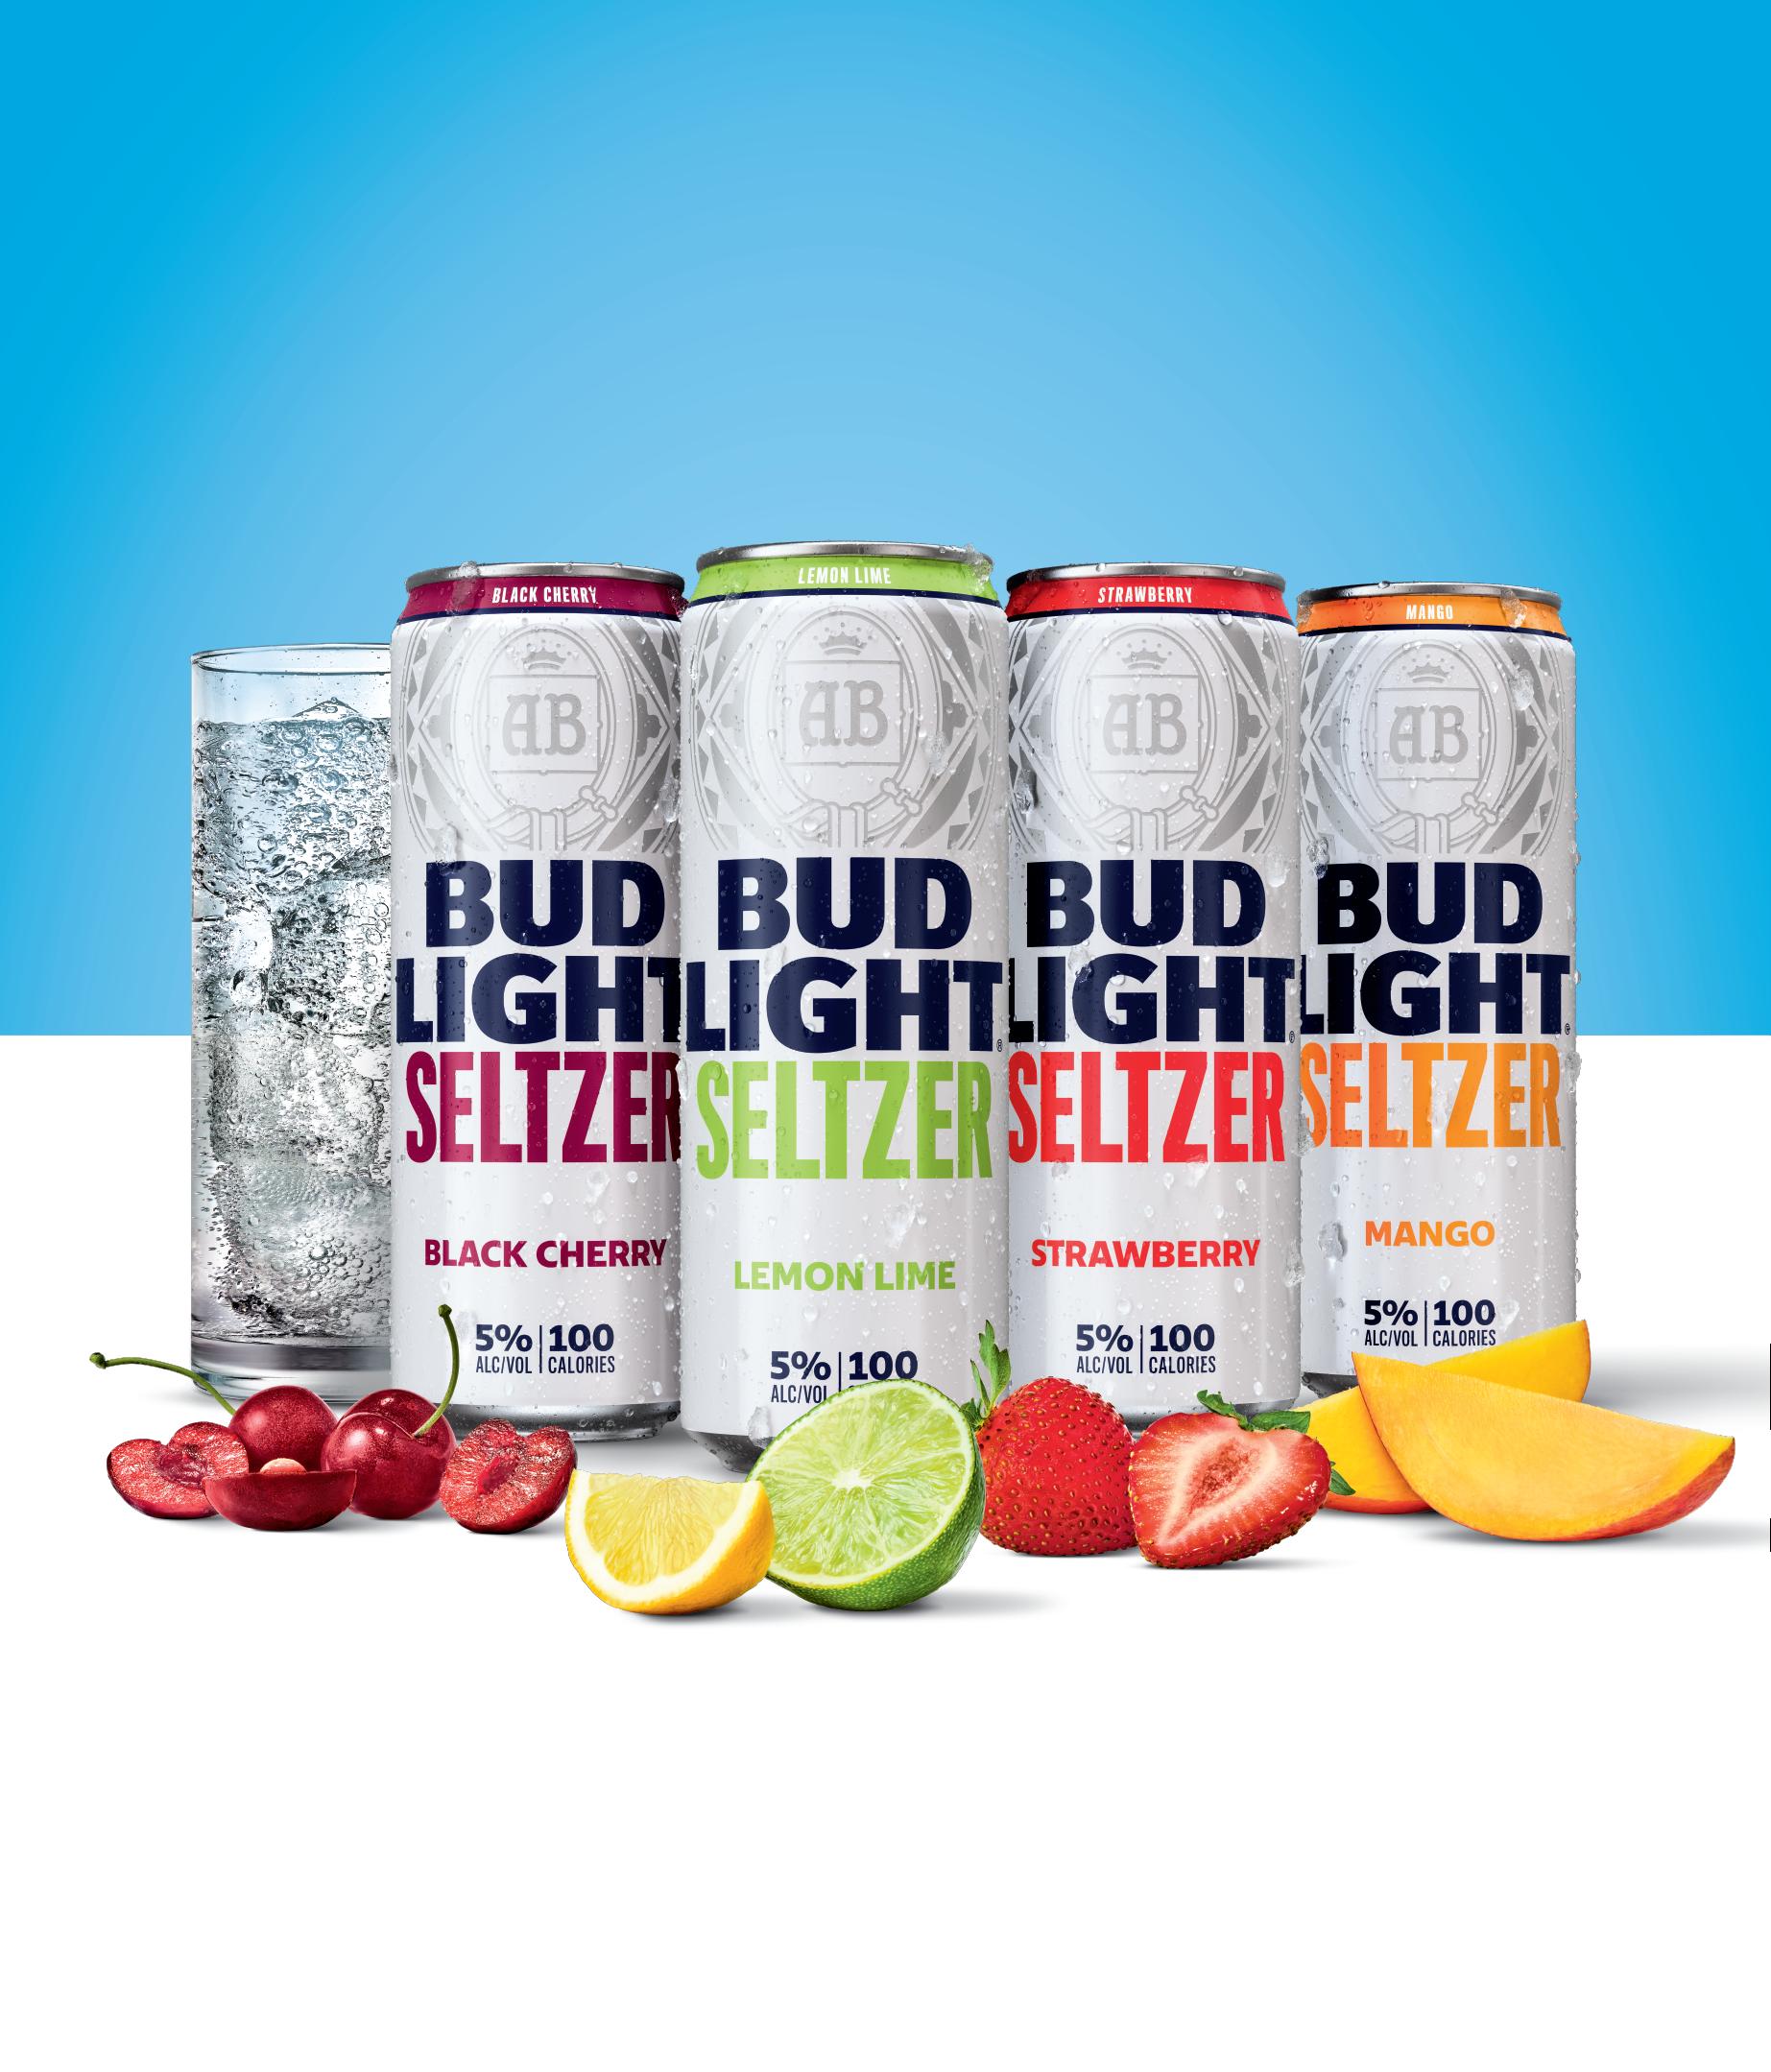 Bud Light Makes $100 Million Bet On Hard Seltzer